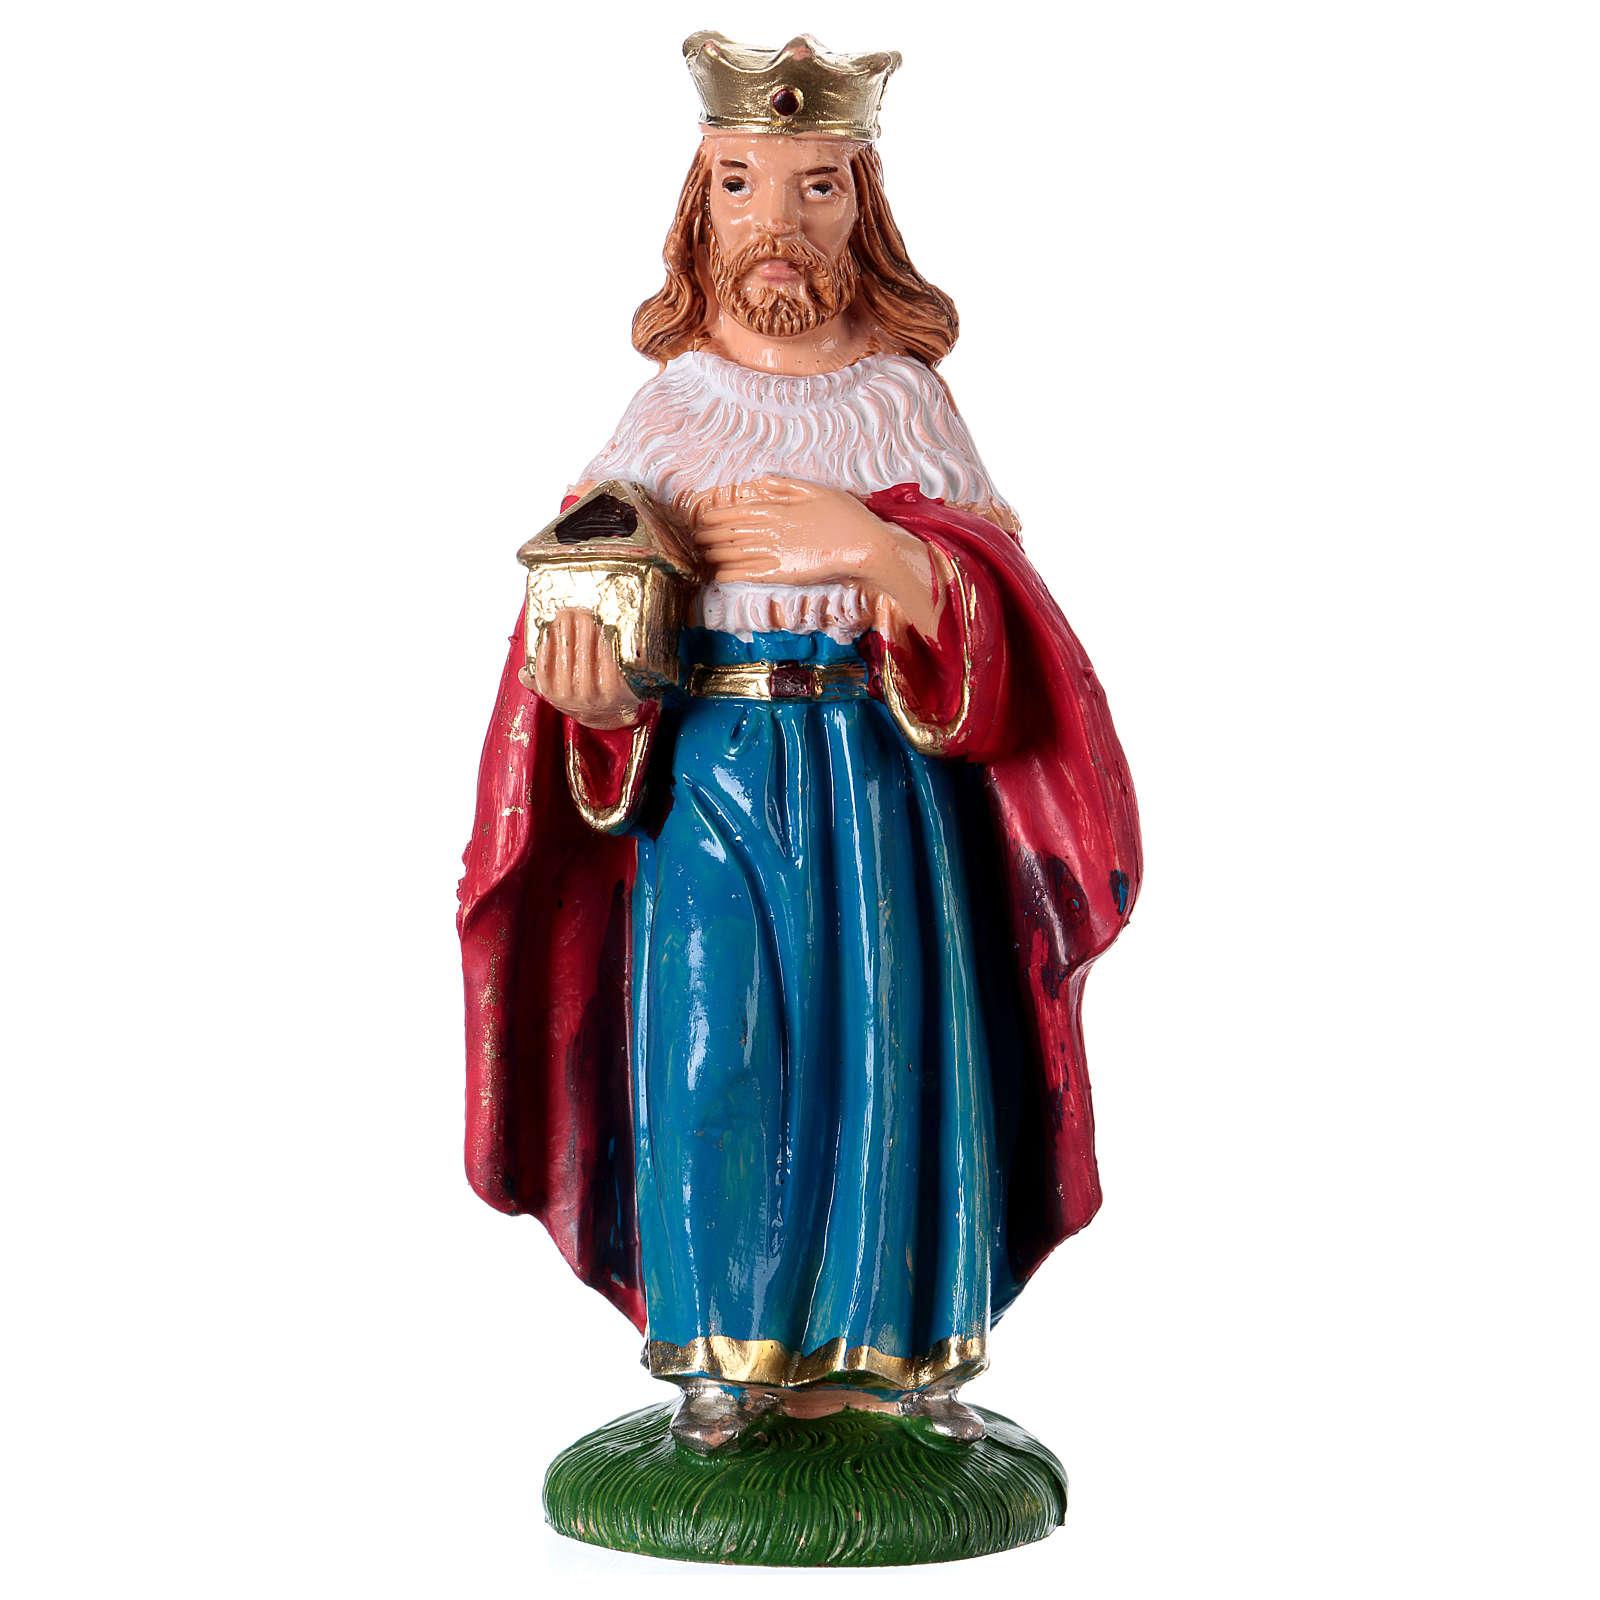 Statuina Re Magio Melchiorre 10 cm pvc 3